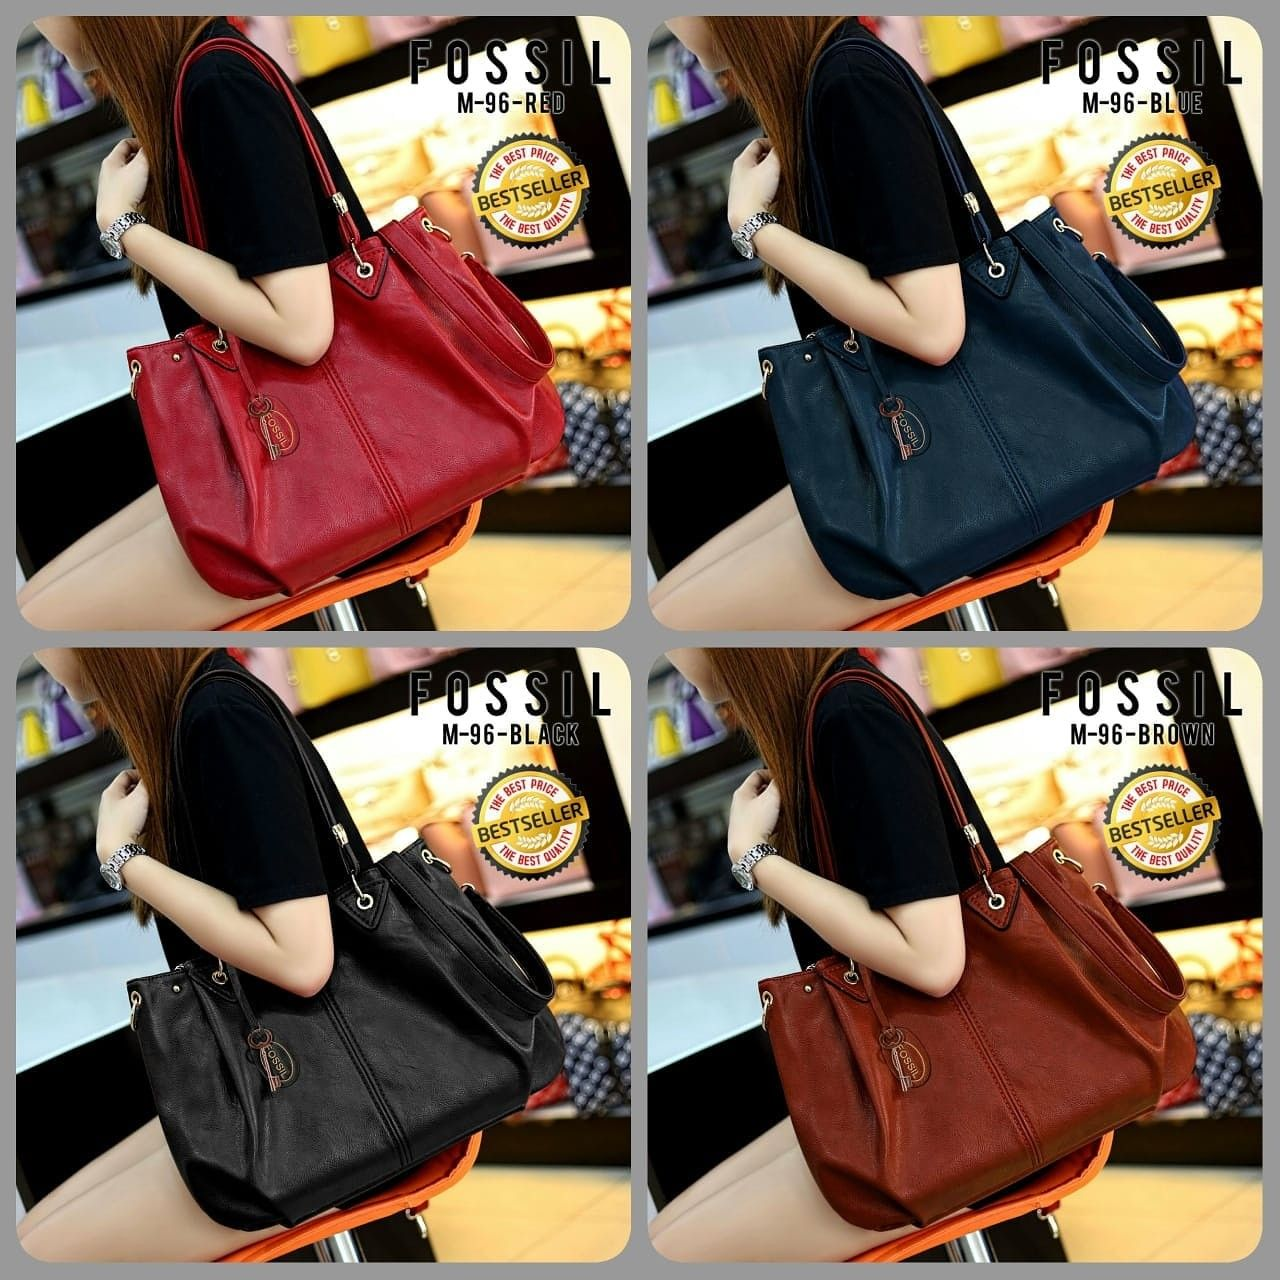 Fossil Bag Seri M96 Leather Quality Semipremiun 1 1 Kg Ukuran